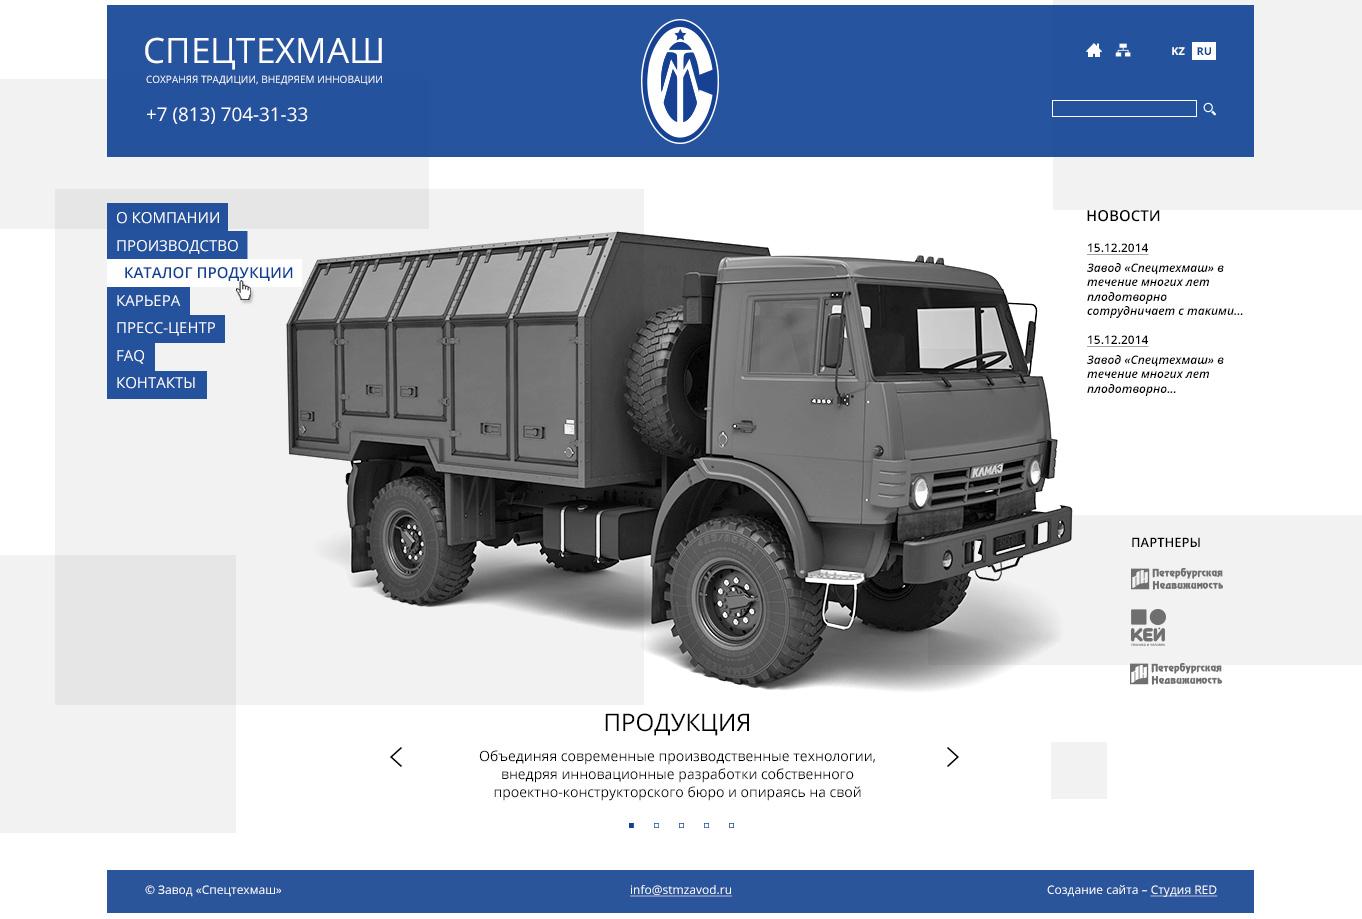 Дизайн сайта, завод, СпецТехМаш